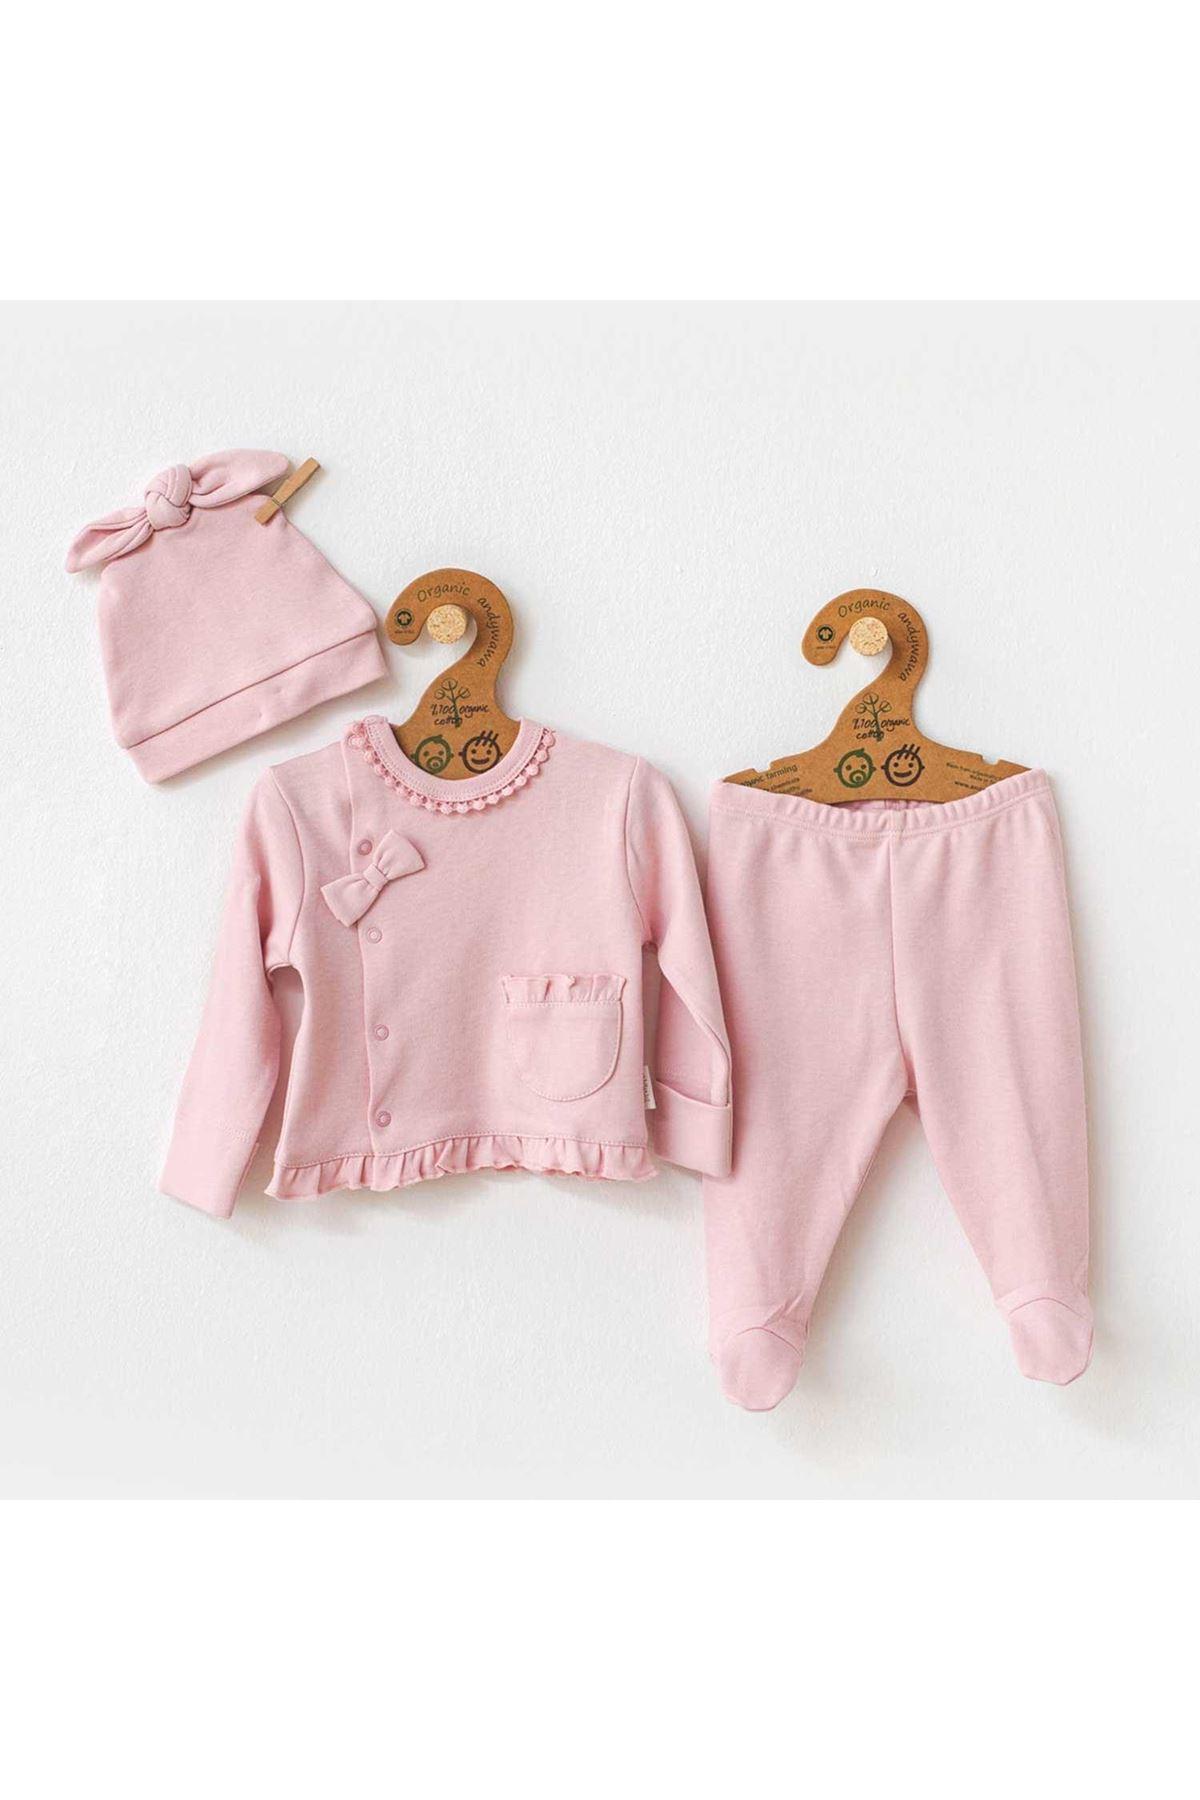 Andywawa AC21204 Natura Wawa 3lü Bebek Takım Pink